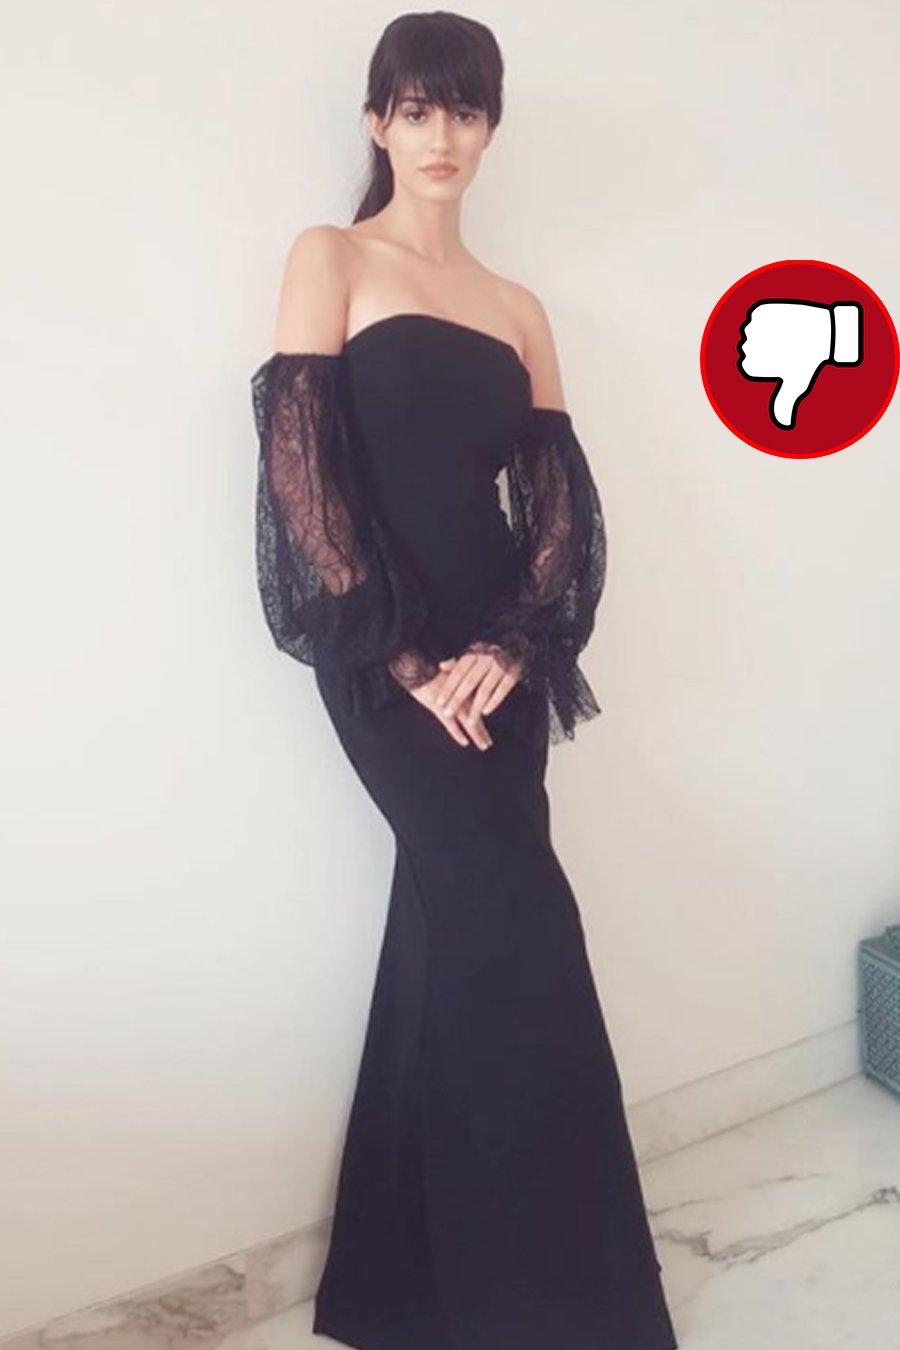 disha patani in a black gown